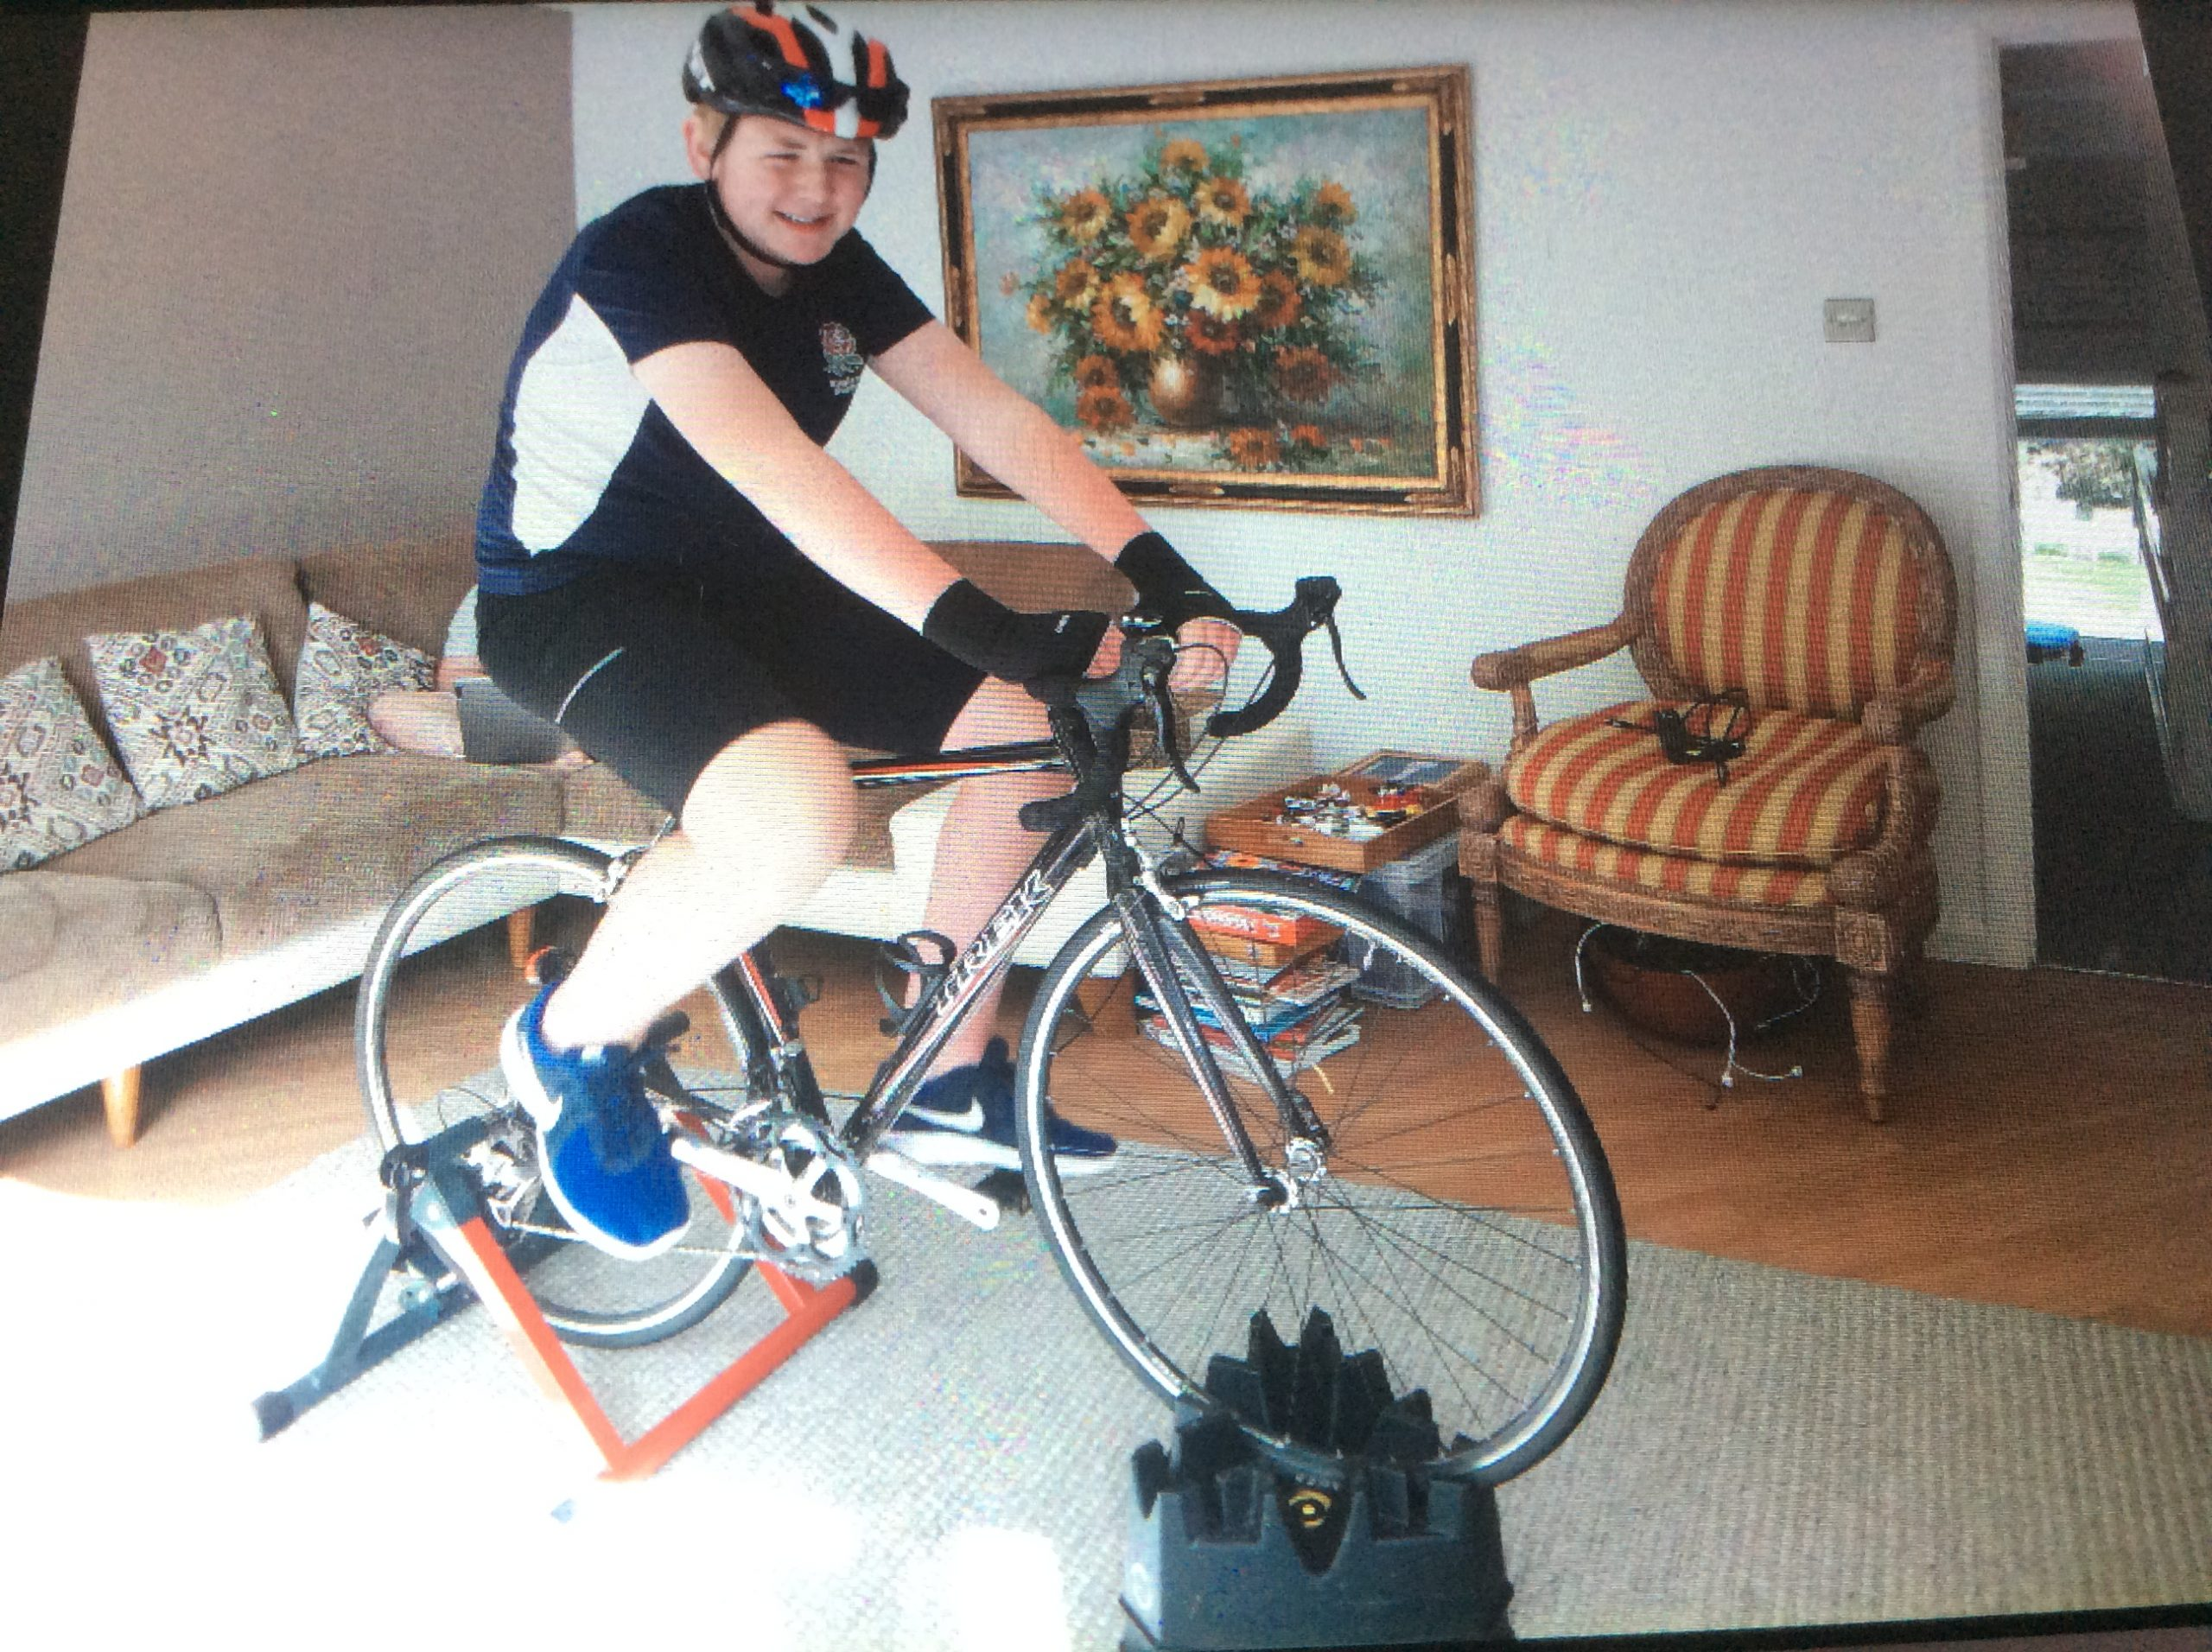 Tom's Cycling Challenge